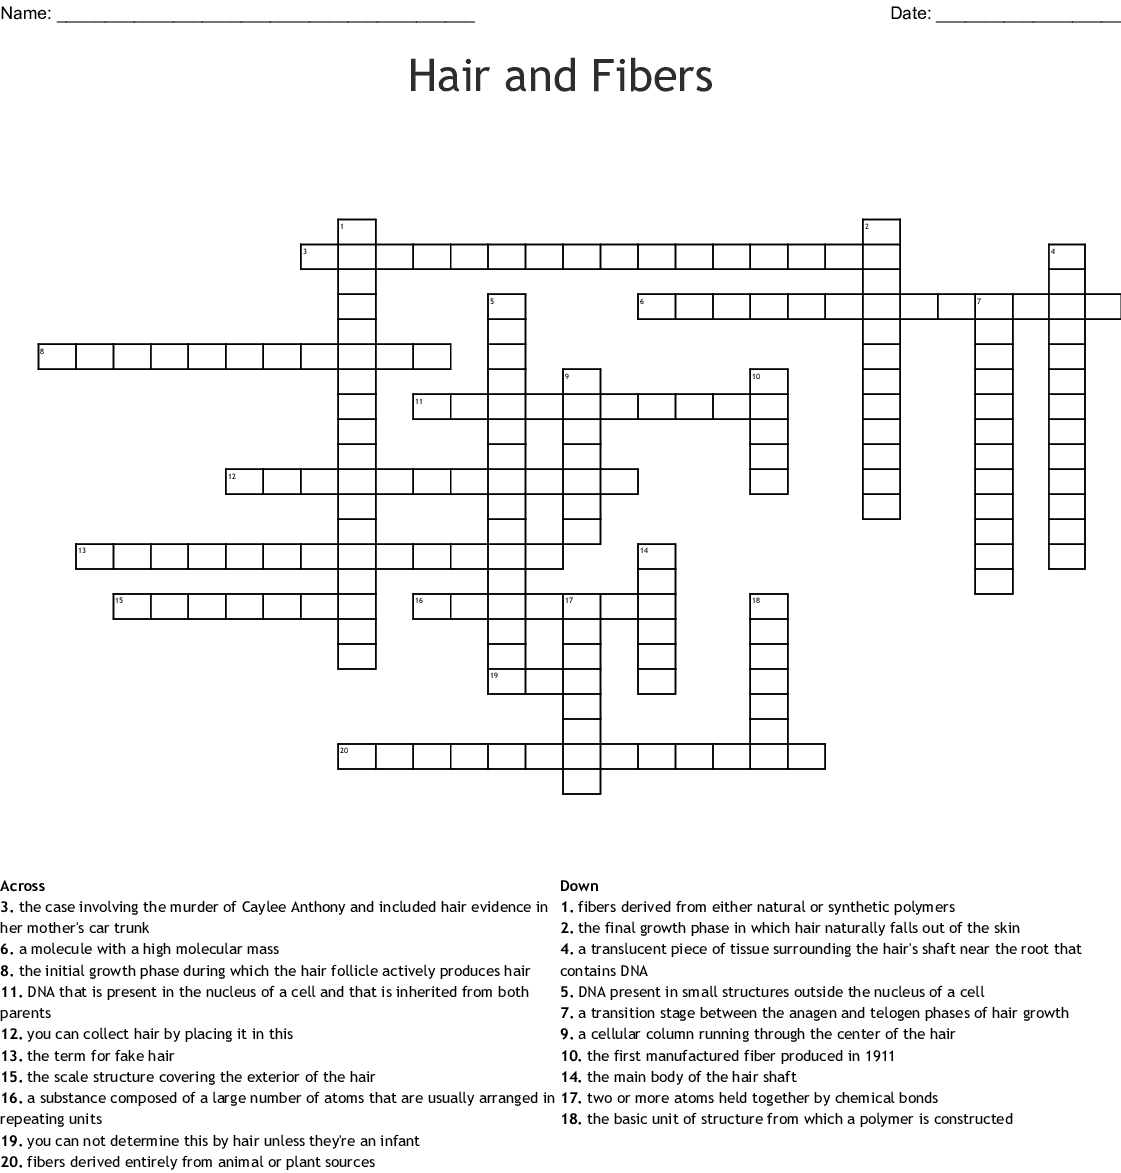 Hair Fiber Evidence Worksheet Answers